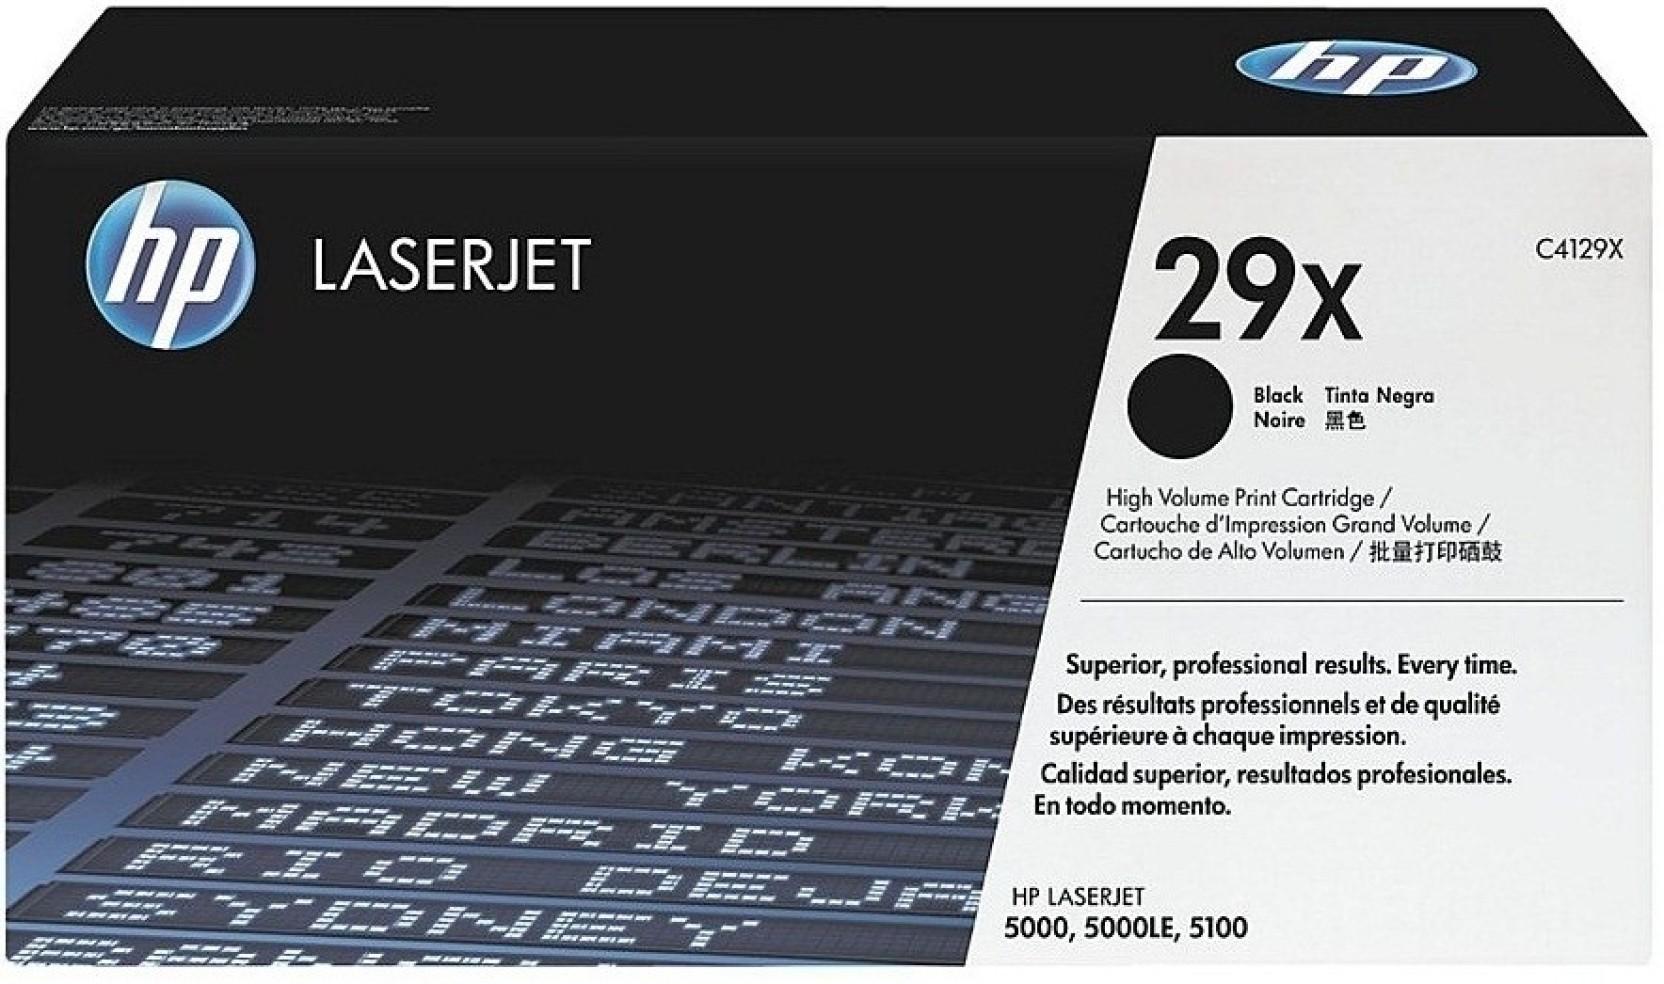 Hp 29x Black Laserjet Toner Cartridge Compare